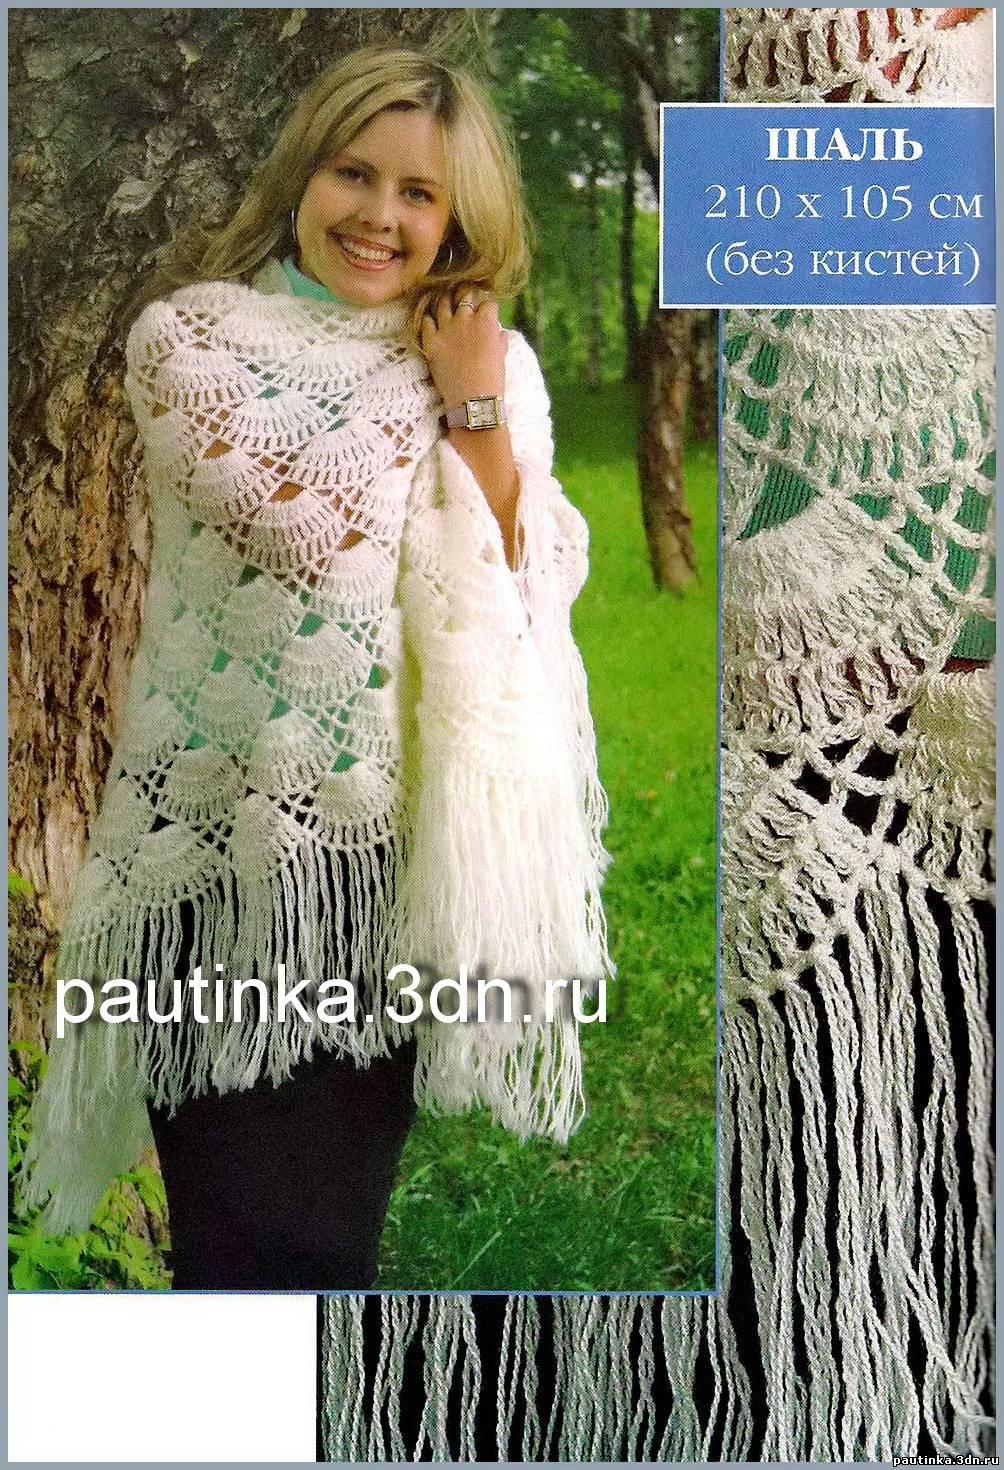 Ажурная шаль http://pautinka.3dn.ru/publ/skhemy...hkom/20-1-0-743.